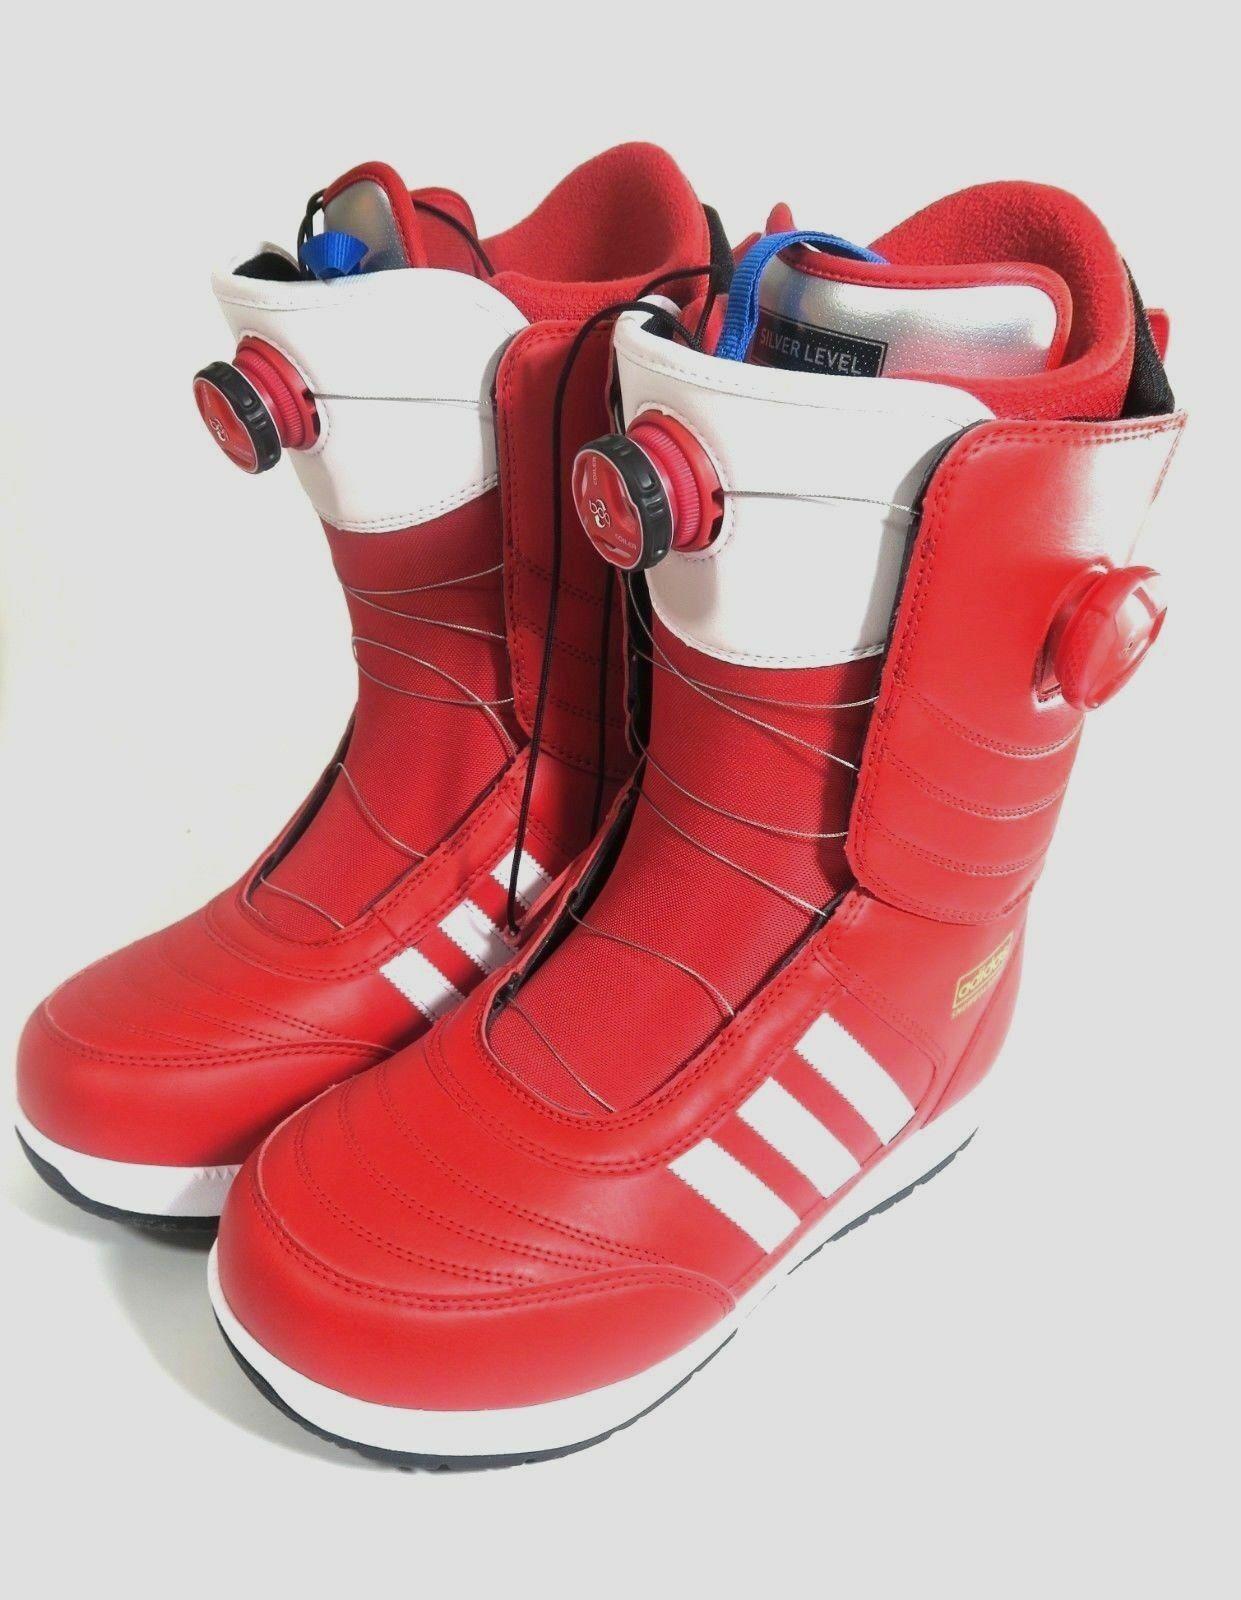 Adidas response ADV snowboard rojo bw0987 gr 46 2 3 bota ski zapatos snowboard